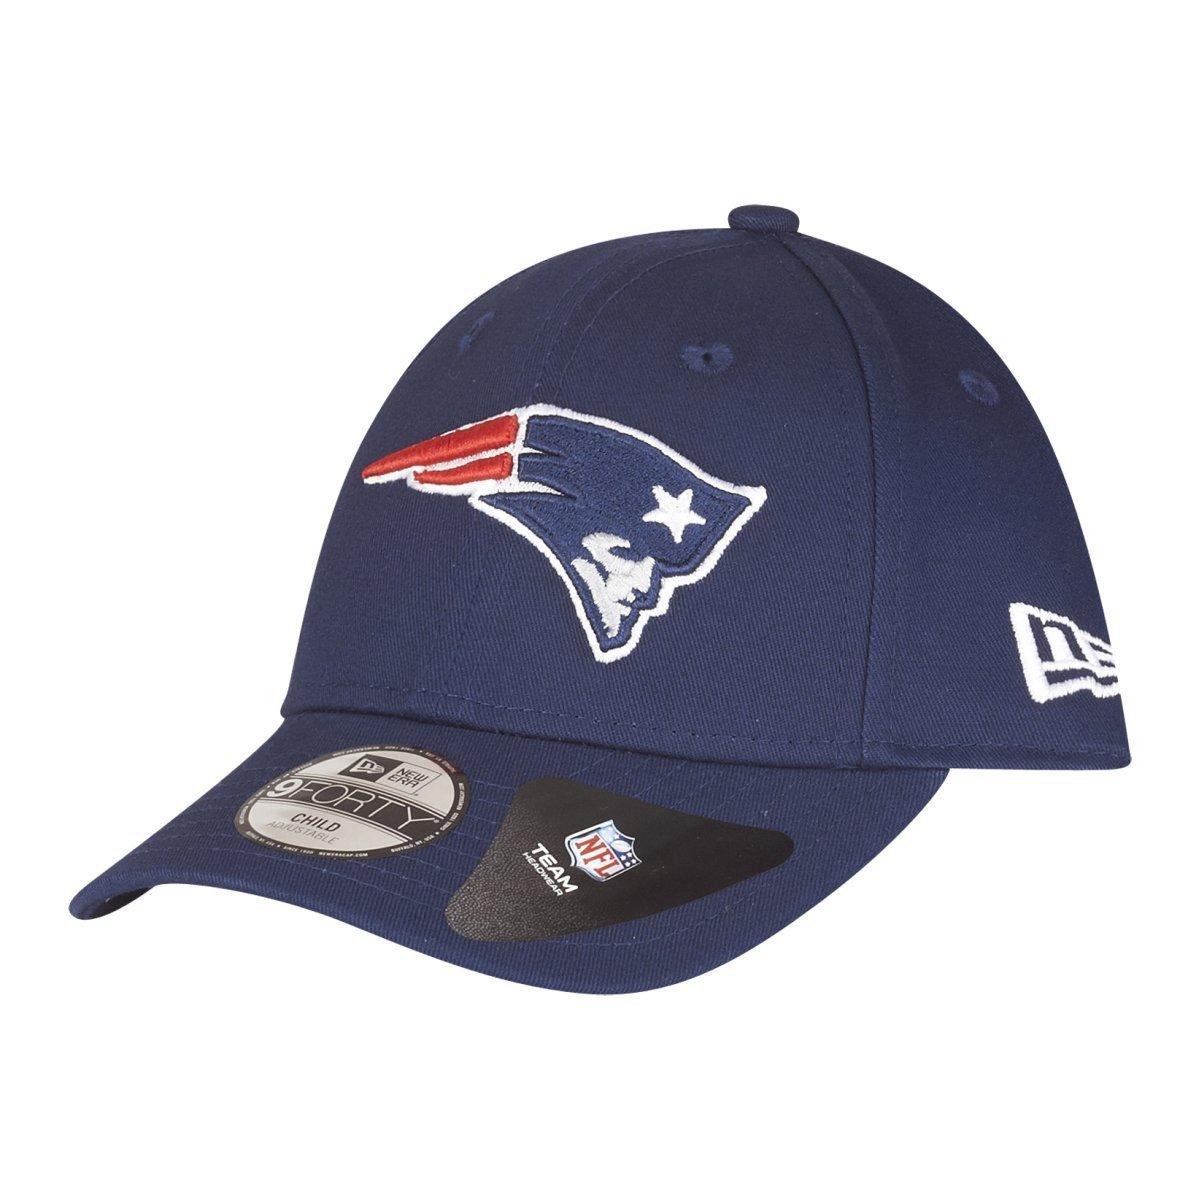 New Era Hats Kids 9FORTY New England Patriots Baseball Cap - Navy Blue